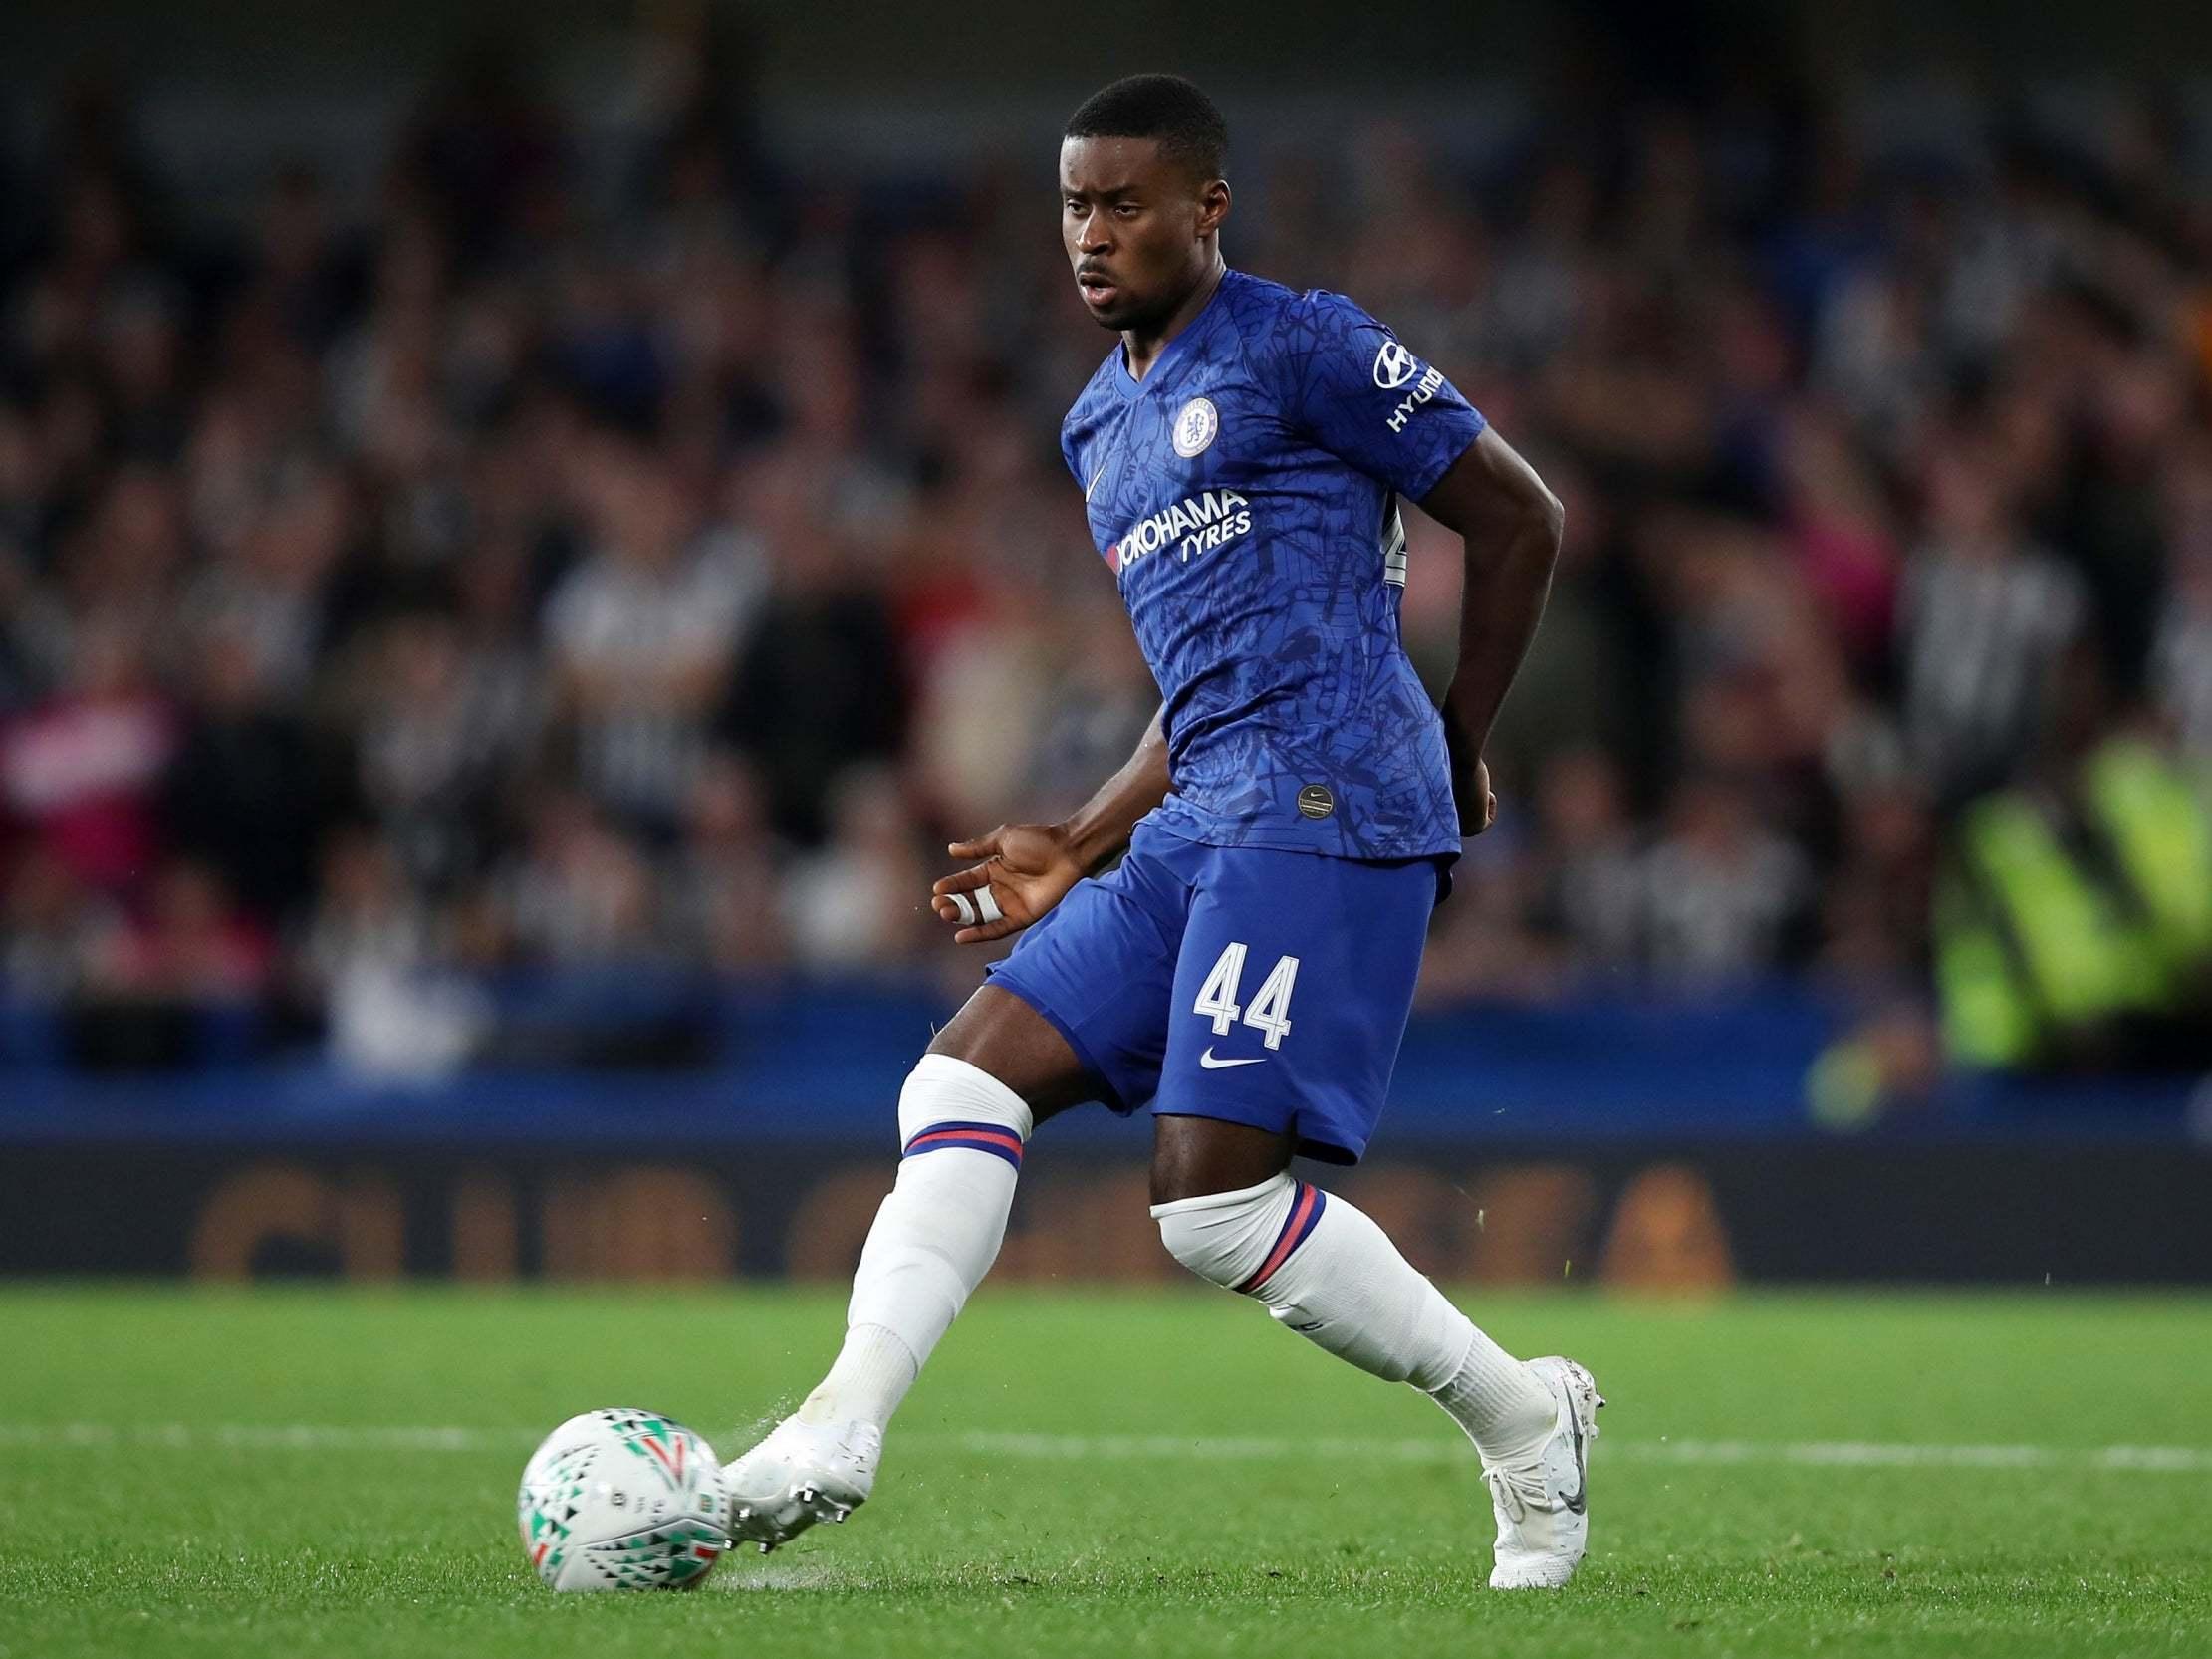 Chelsea news: Marc Guehi reveals John Terry's advice on making senior breakthrough under Frank Lampard